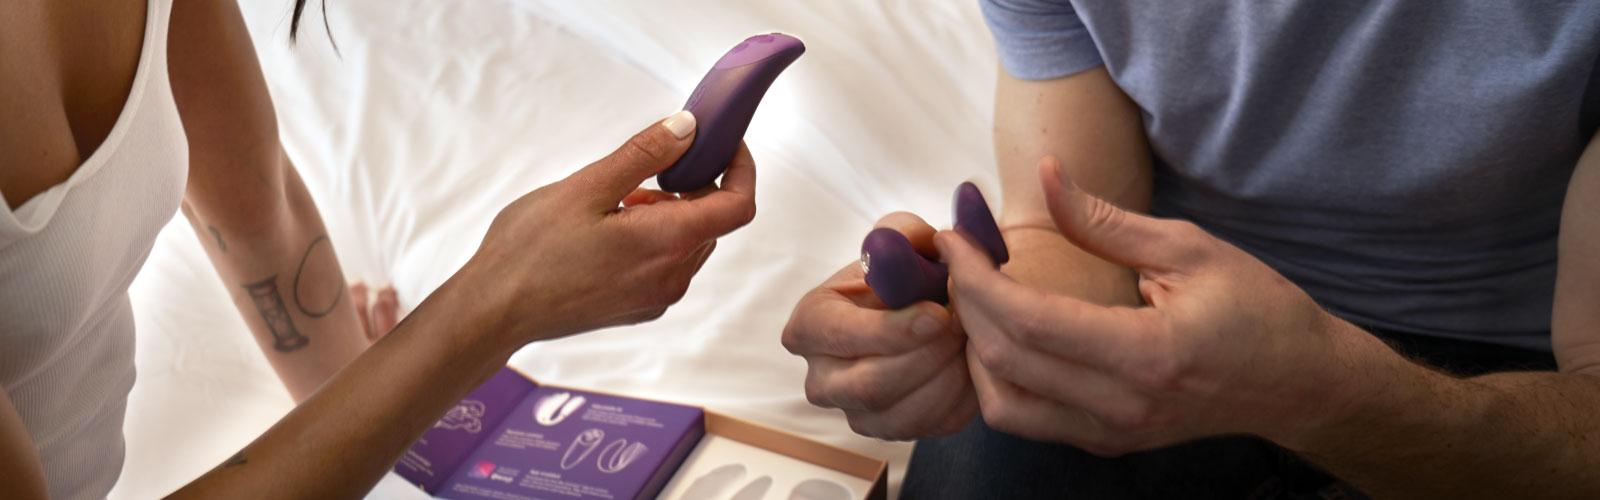 Couple holding vibrator